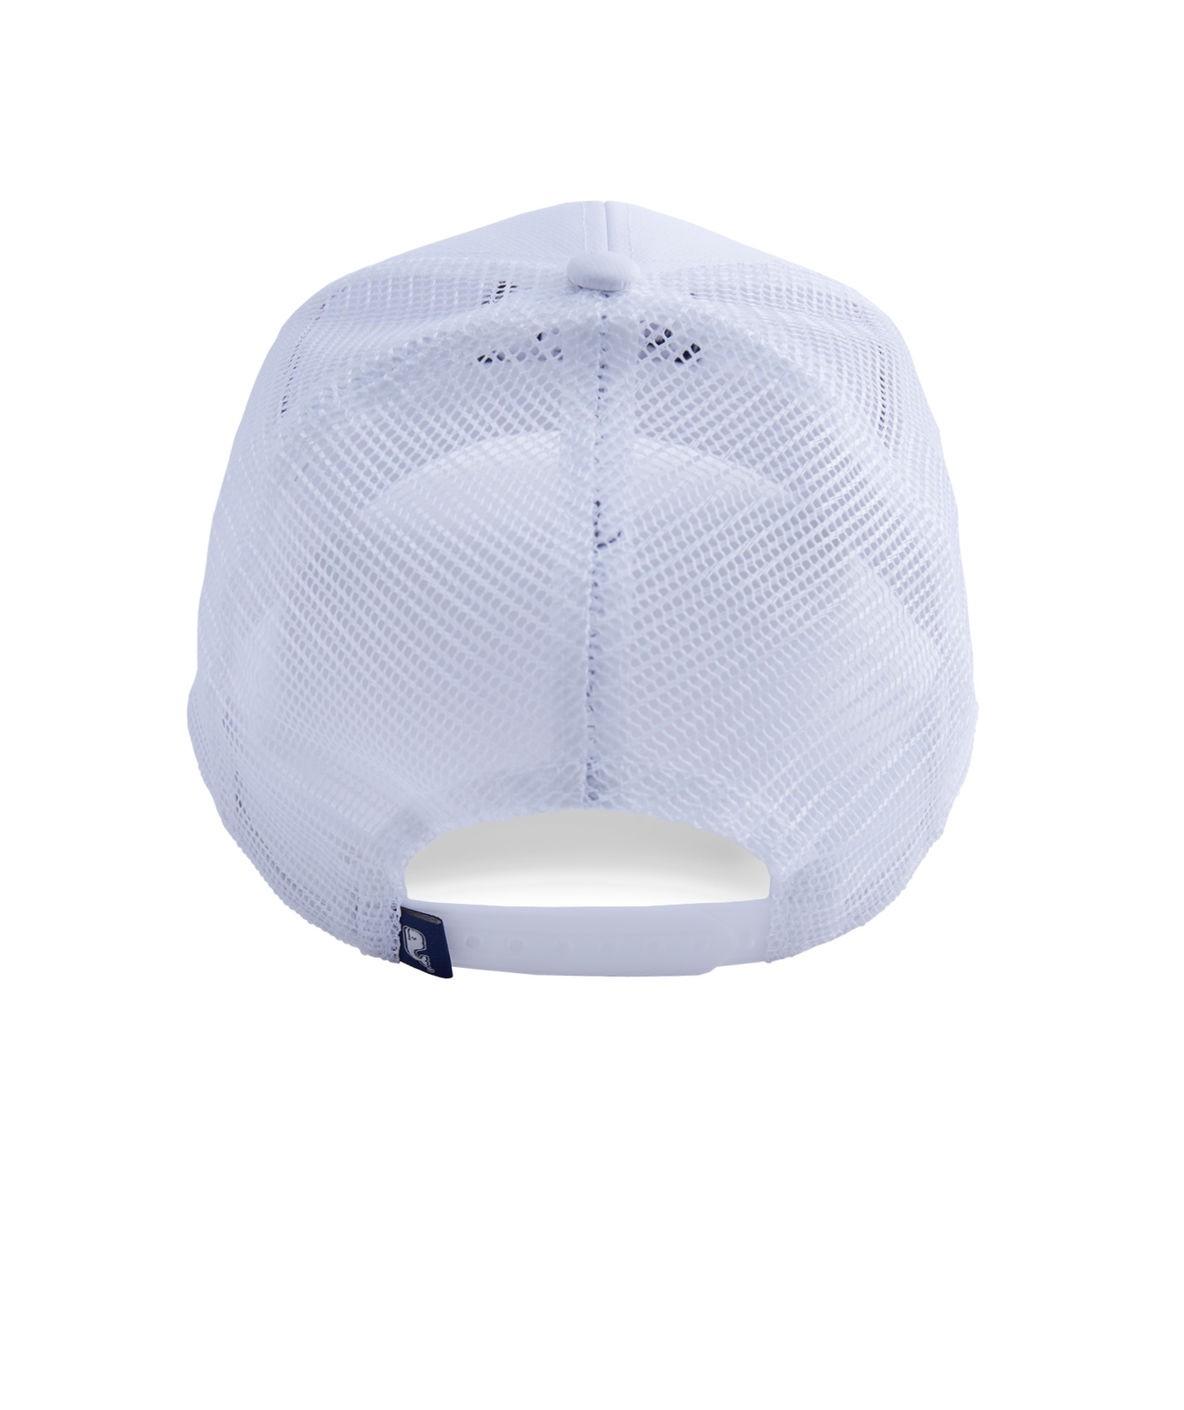 Vineyard Vines Boys Embroidered Whale Dot Performance Trucker Hat - White  Cap 1Sz ea195627d78